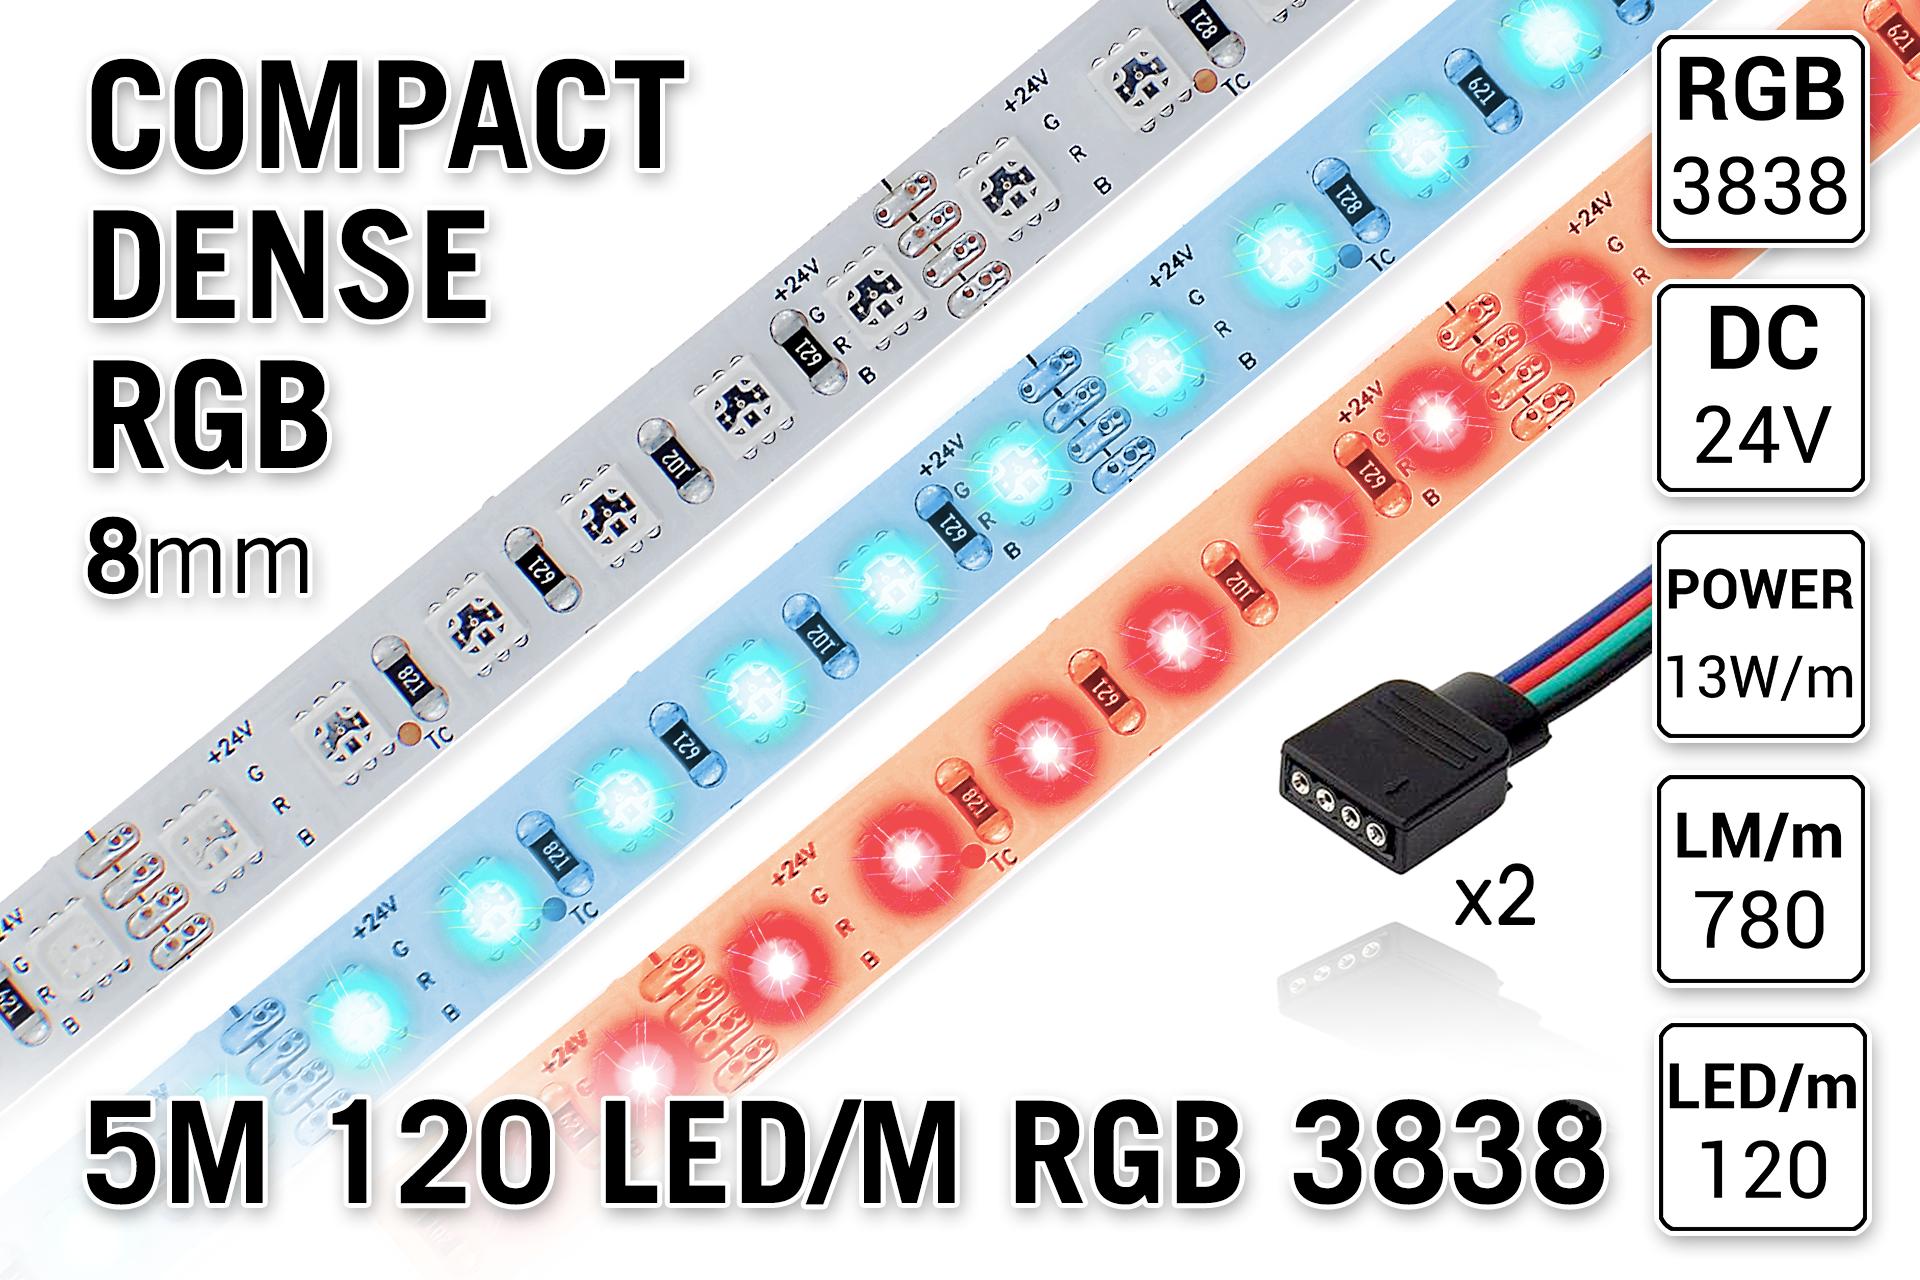 AppLamp ProLine PRO LINE Compacte RGB Kleur Led Strip | 5m 120 Leds pm Type 3838 24V - Losse Strip